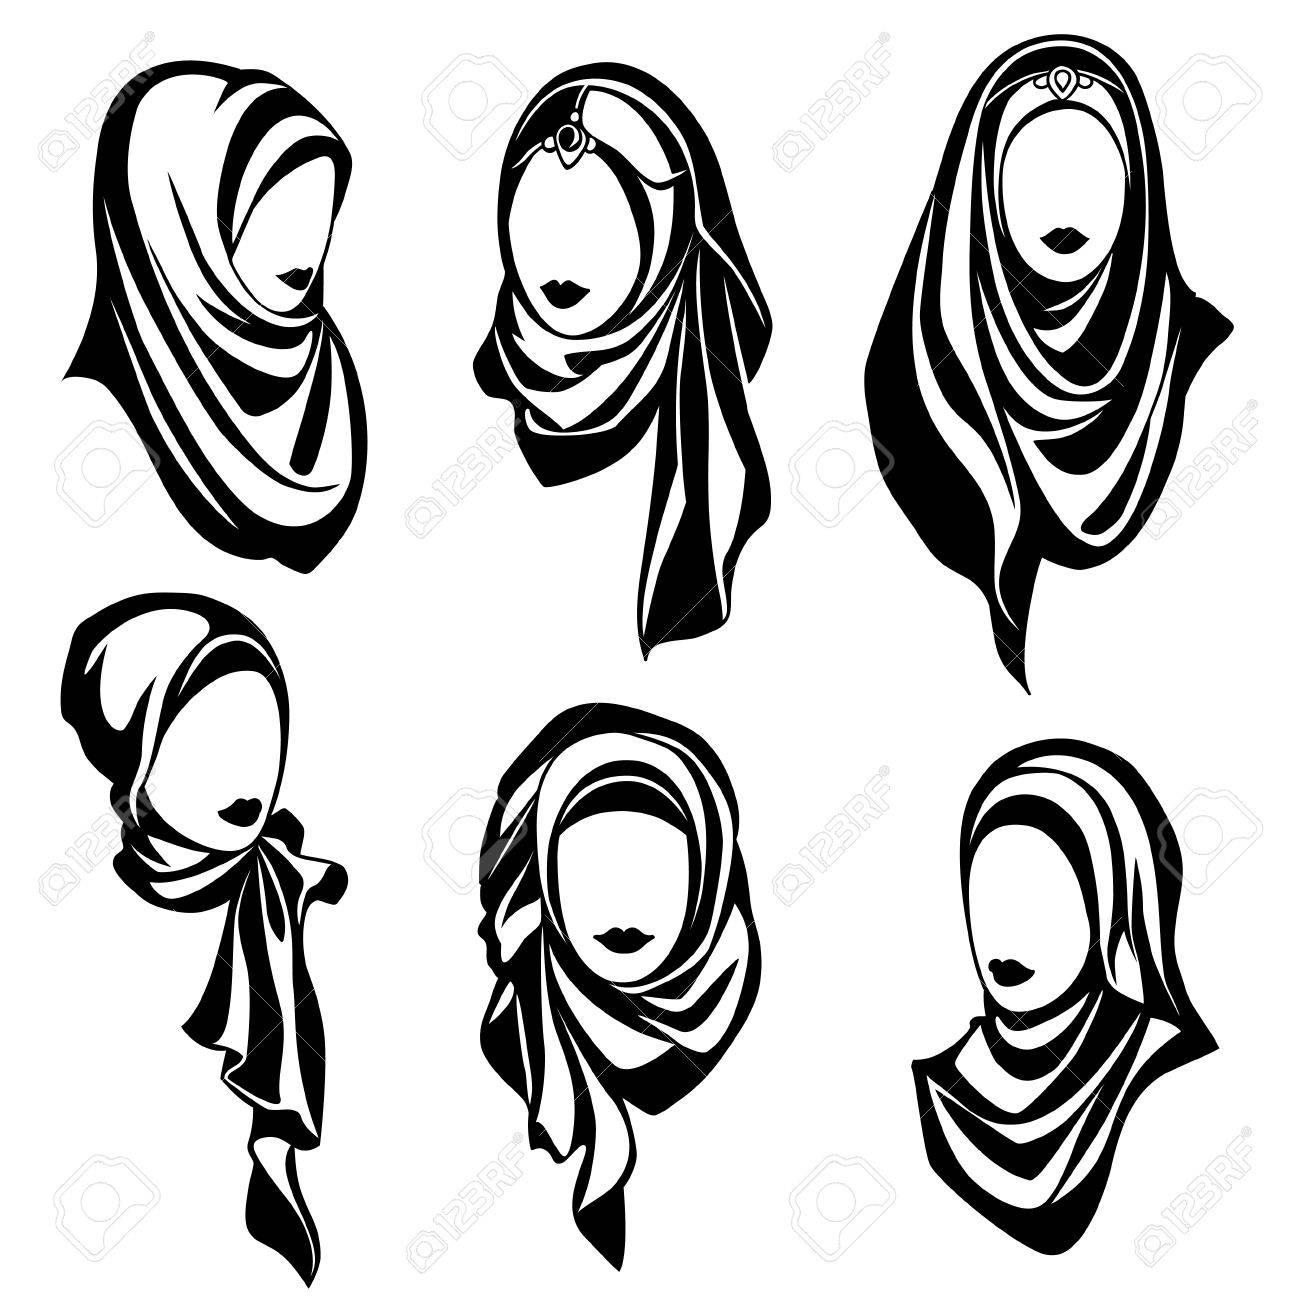 Set of black and white vector logos of muslim oriental girls in hijab